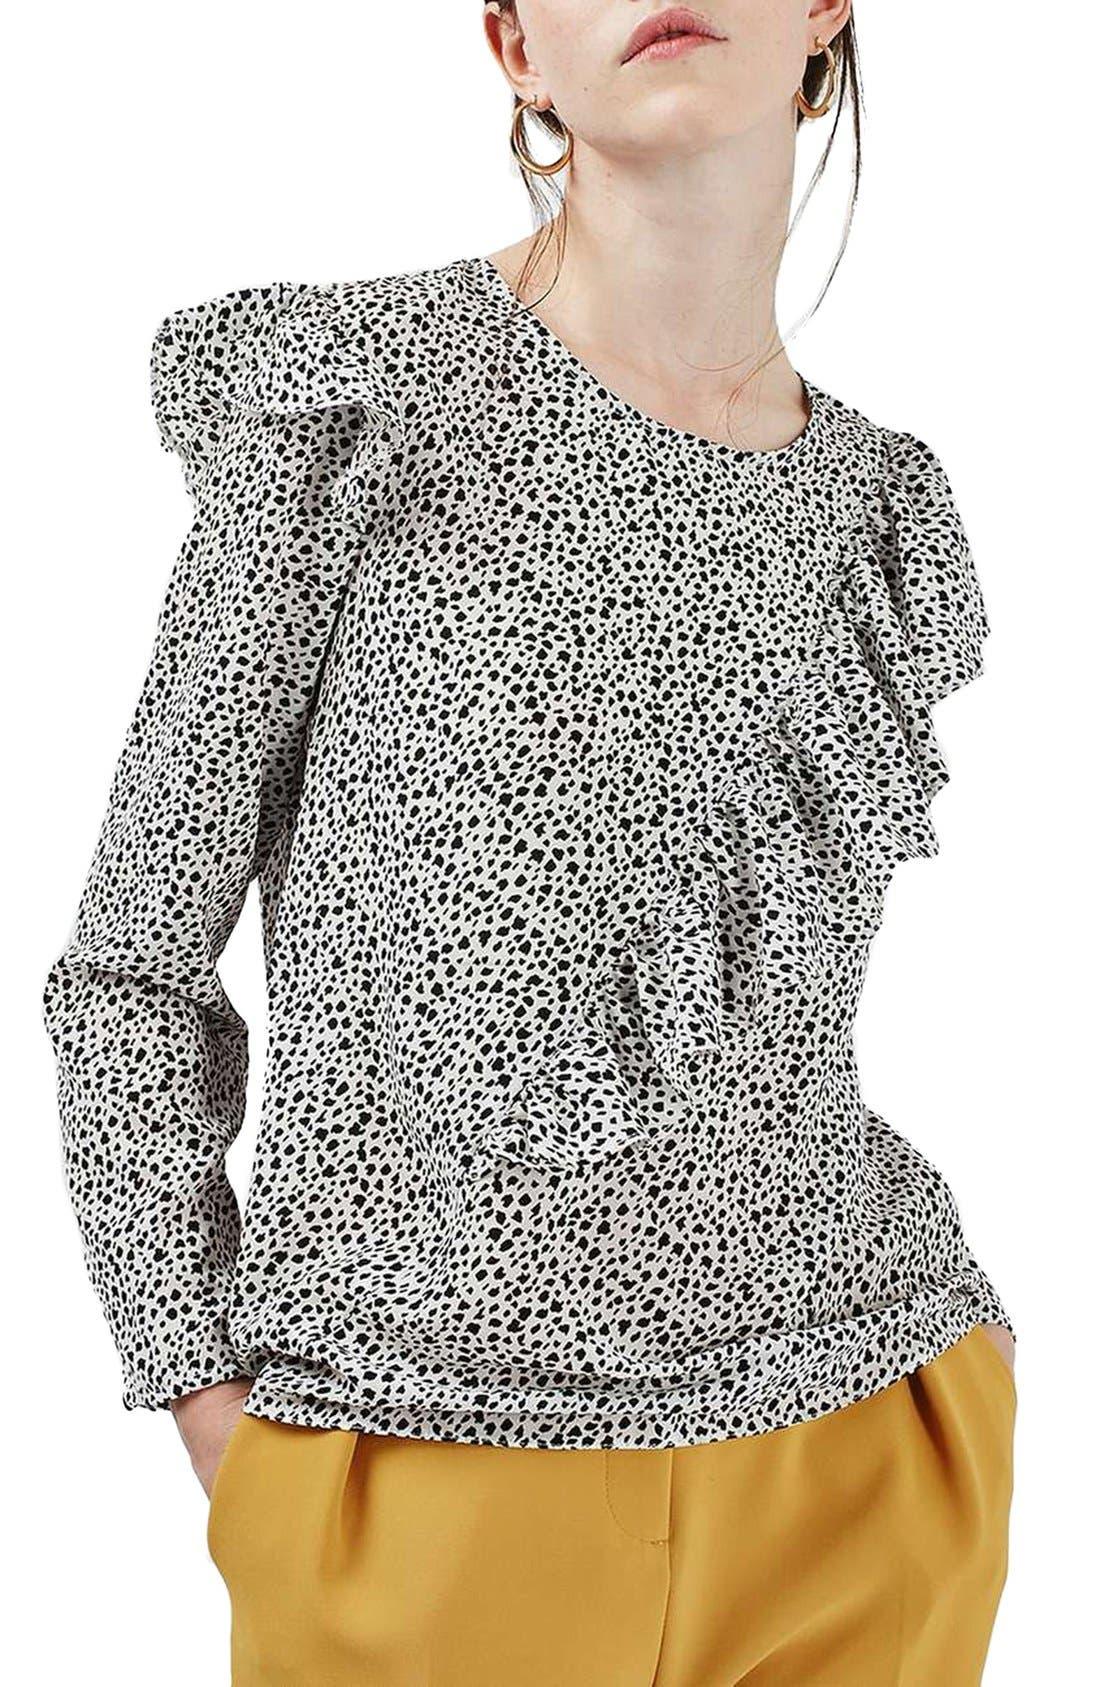 Animal Print Ruffle Blouse,                         Main,                         color, Black Multi